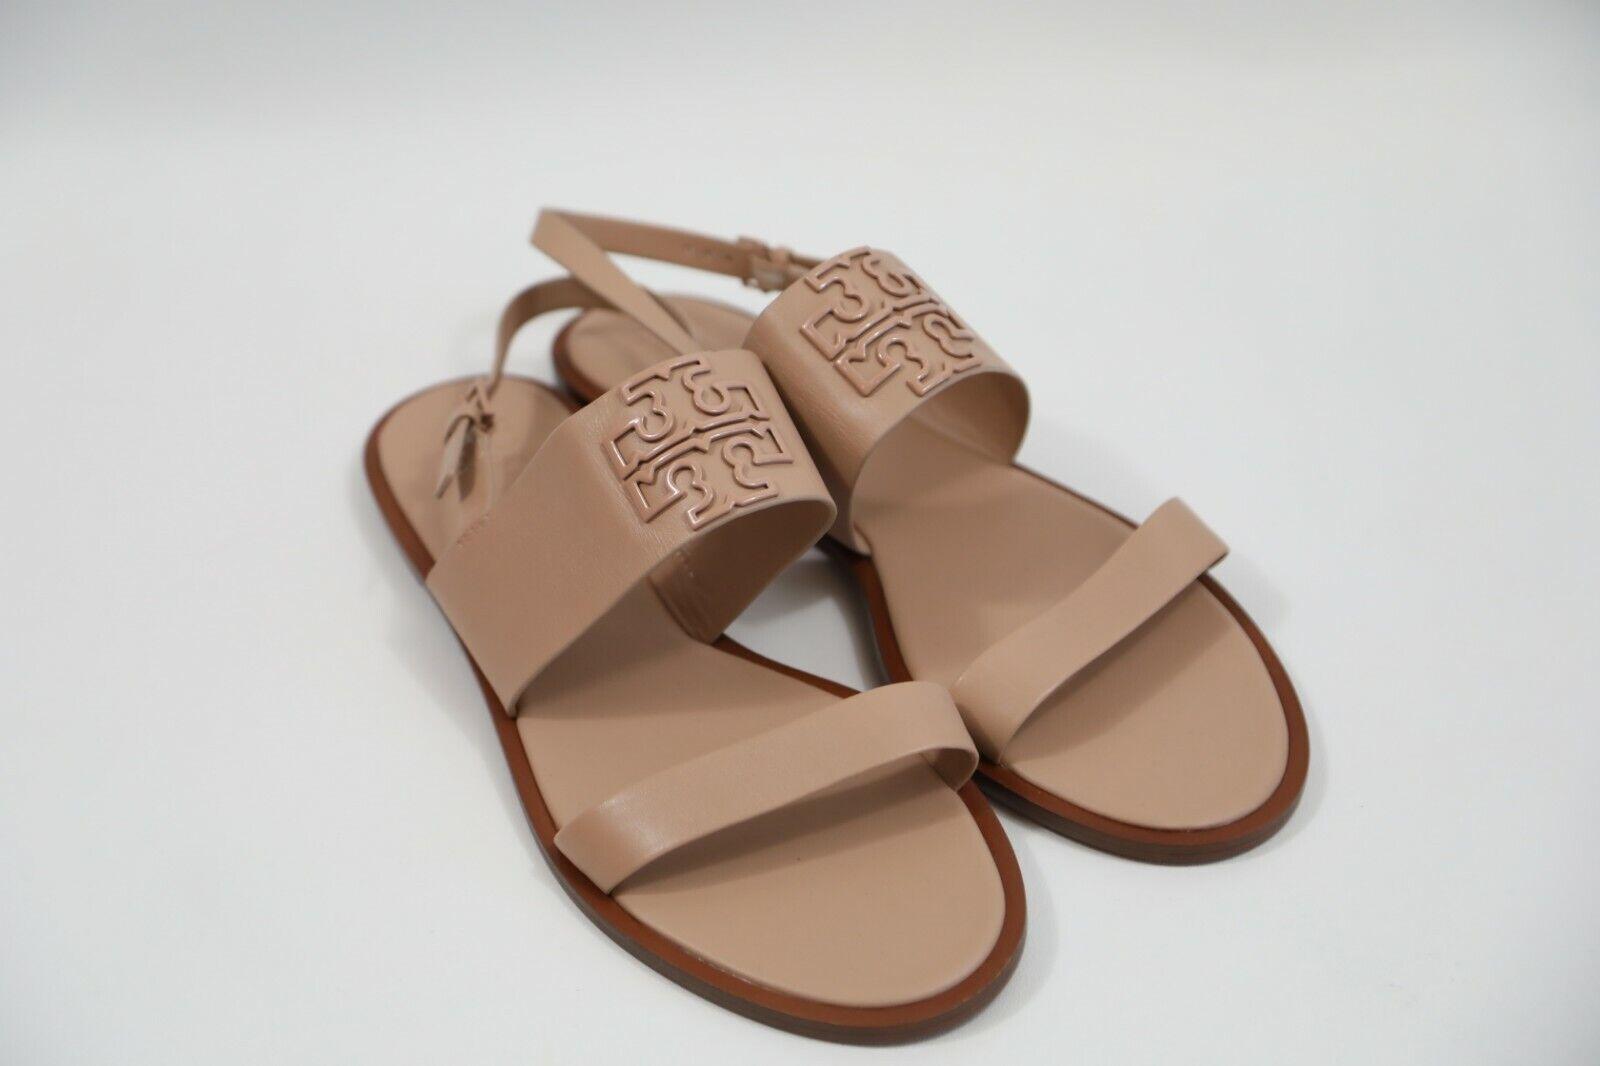 _301Tory Burch Logo Strap Strap Strap Sandals Storlek 11 NWOB  kreativa produkter